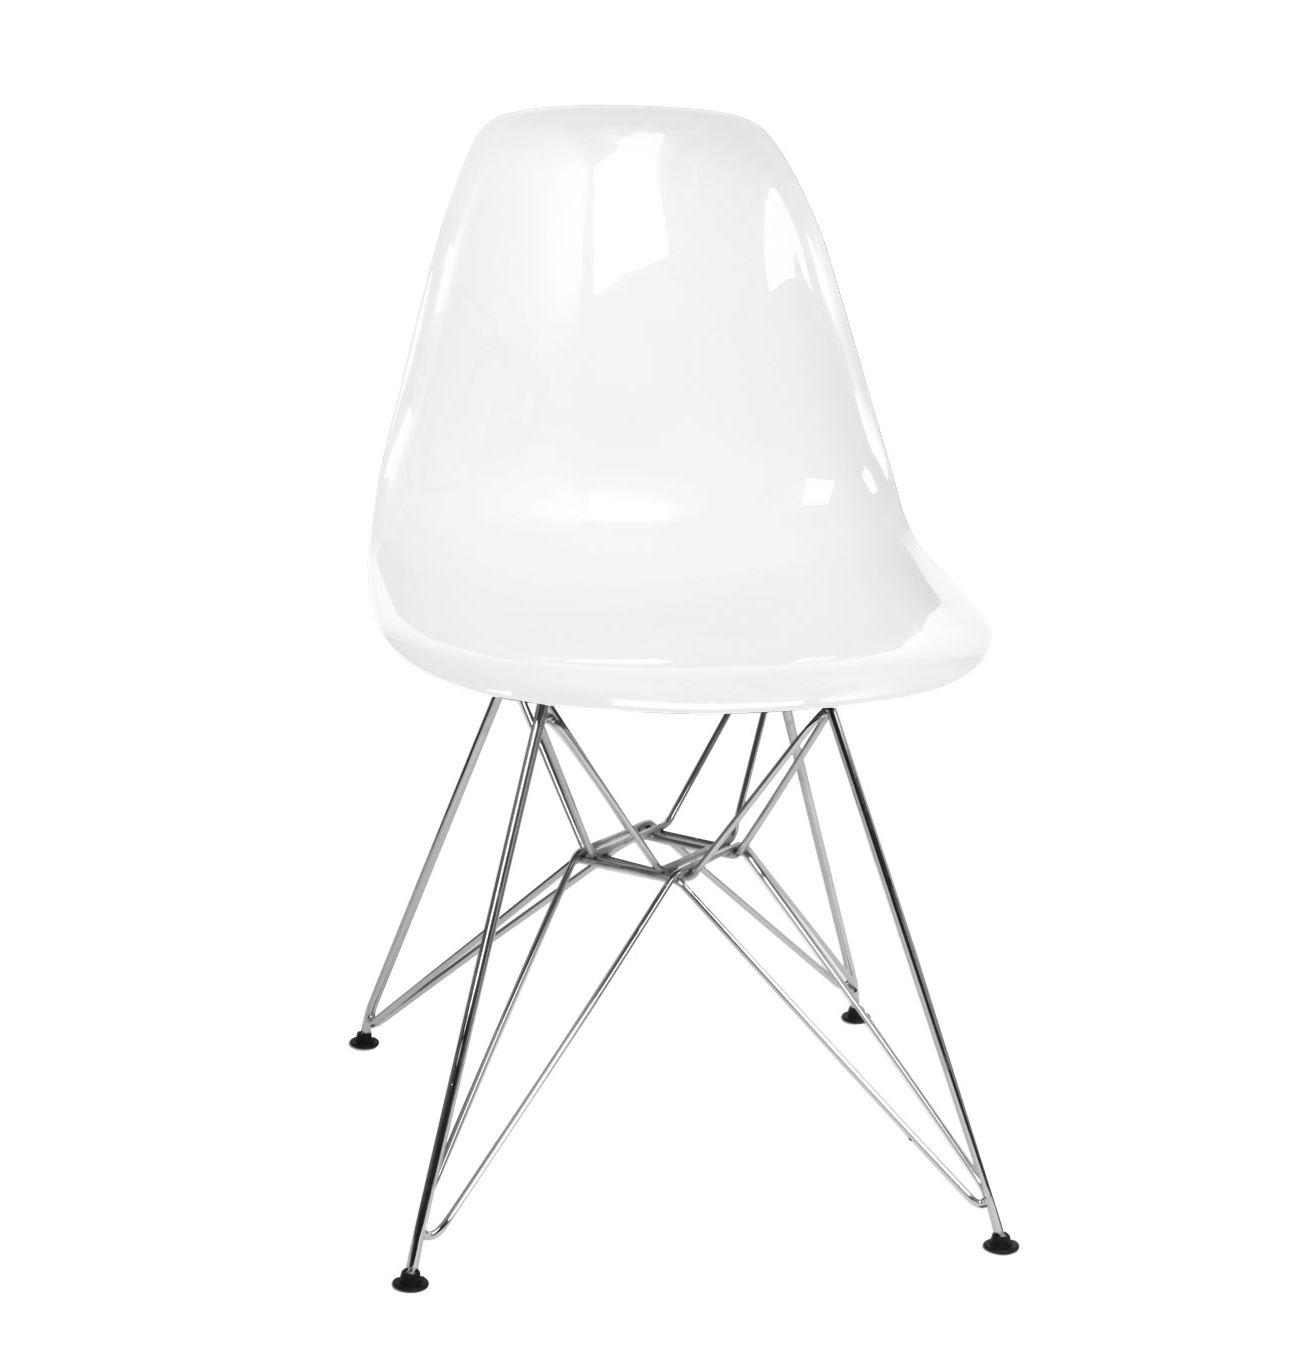 the matt blatt replica eames dsr side chair glossy abs plastic by